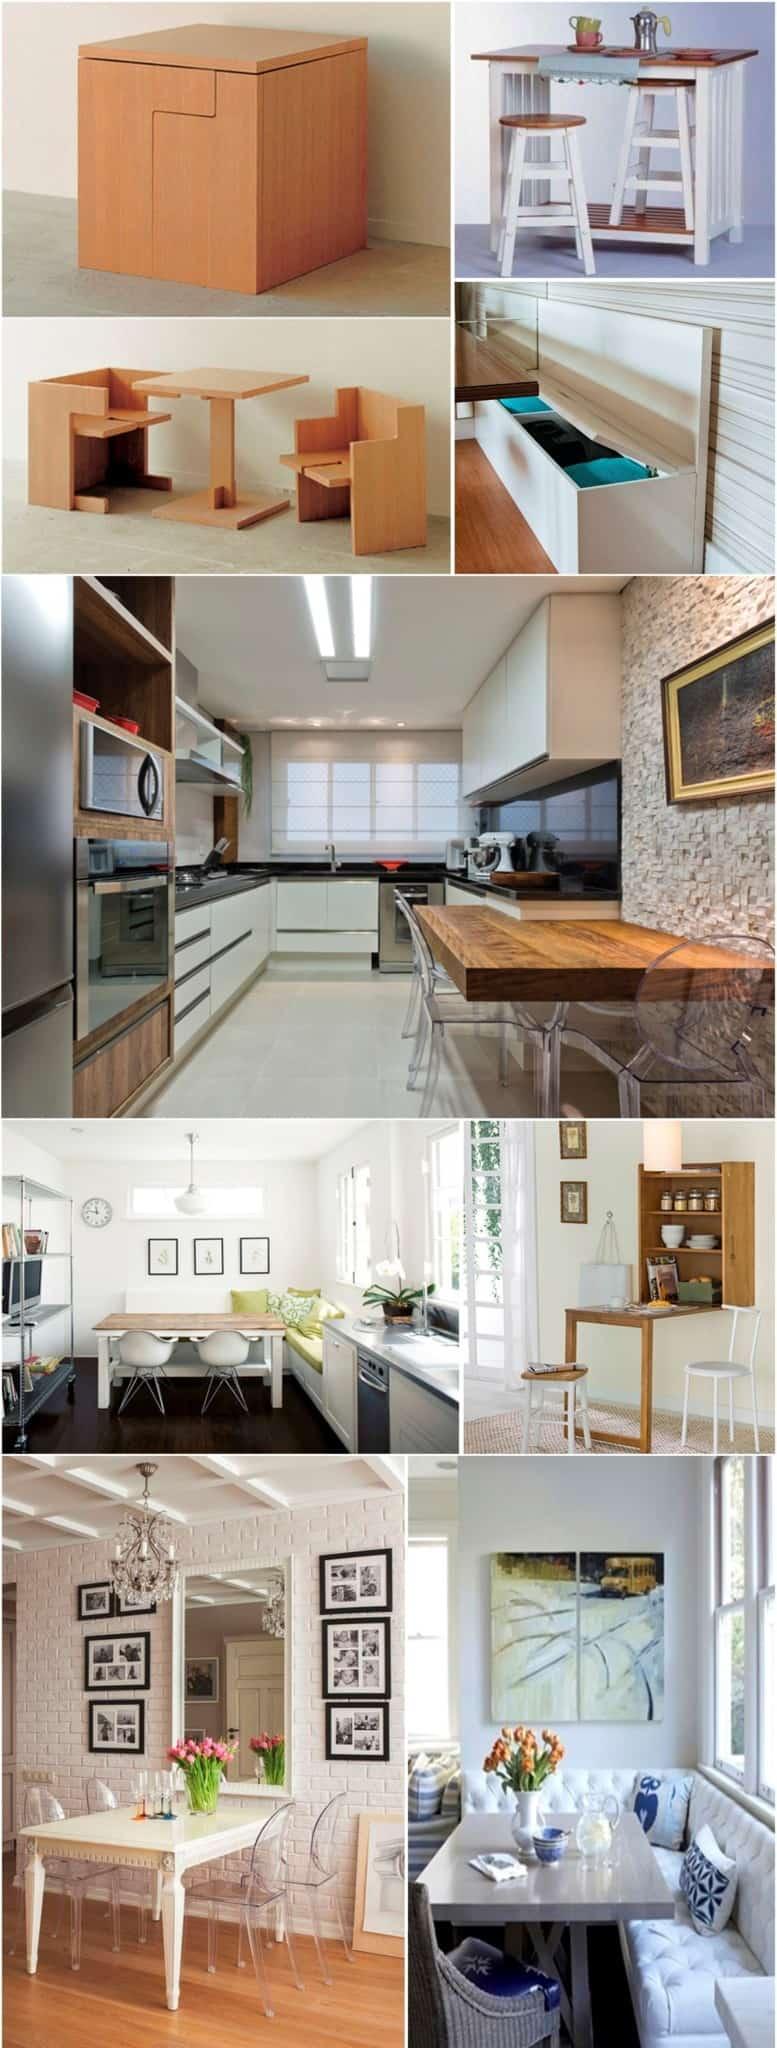 decoracao-para-apartamento-pequeno-sala-de-jantar